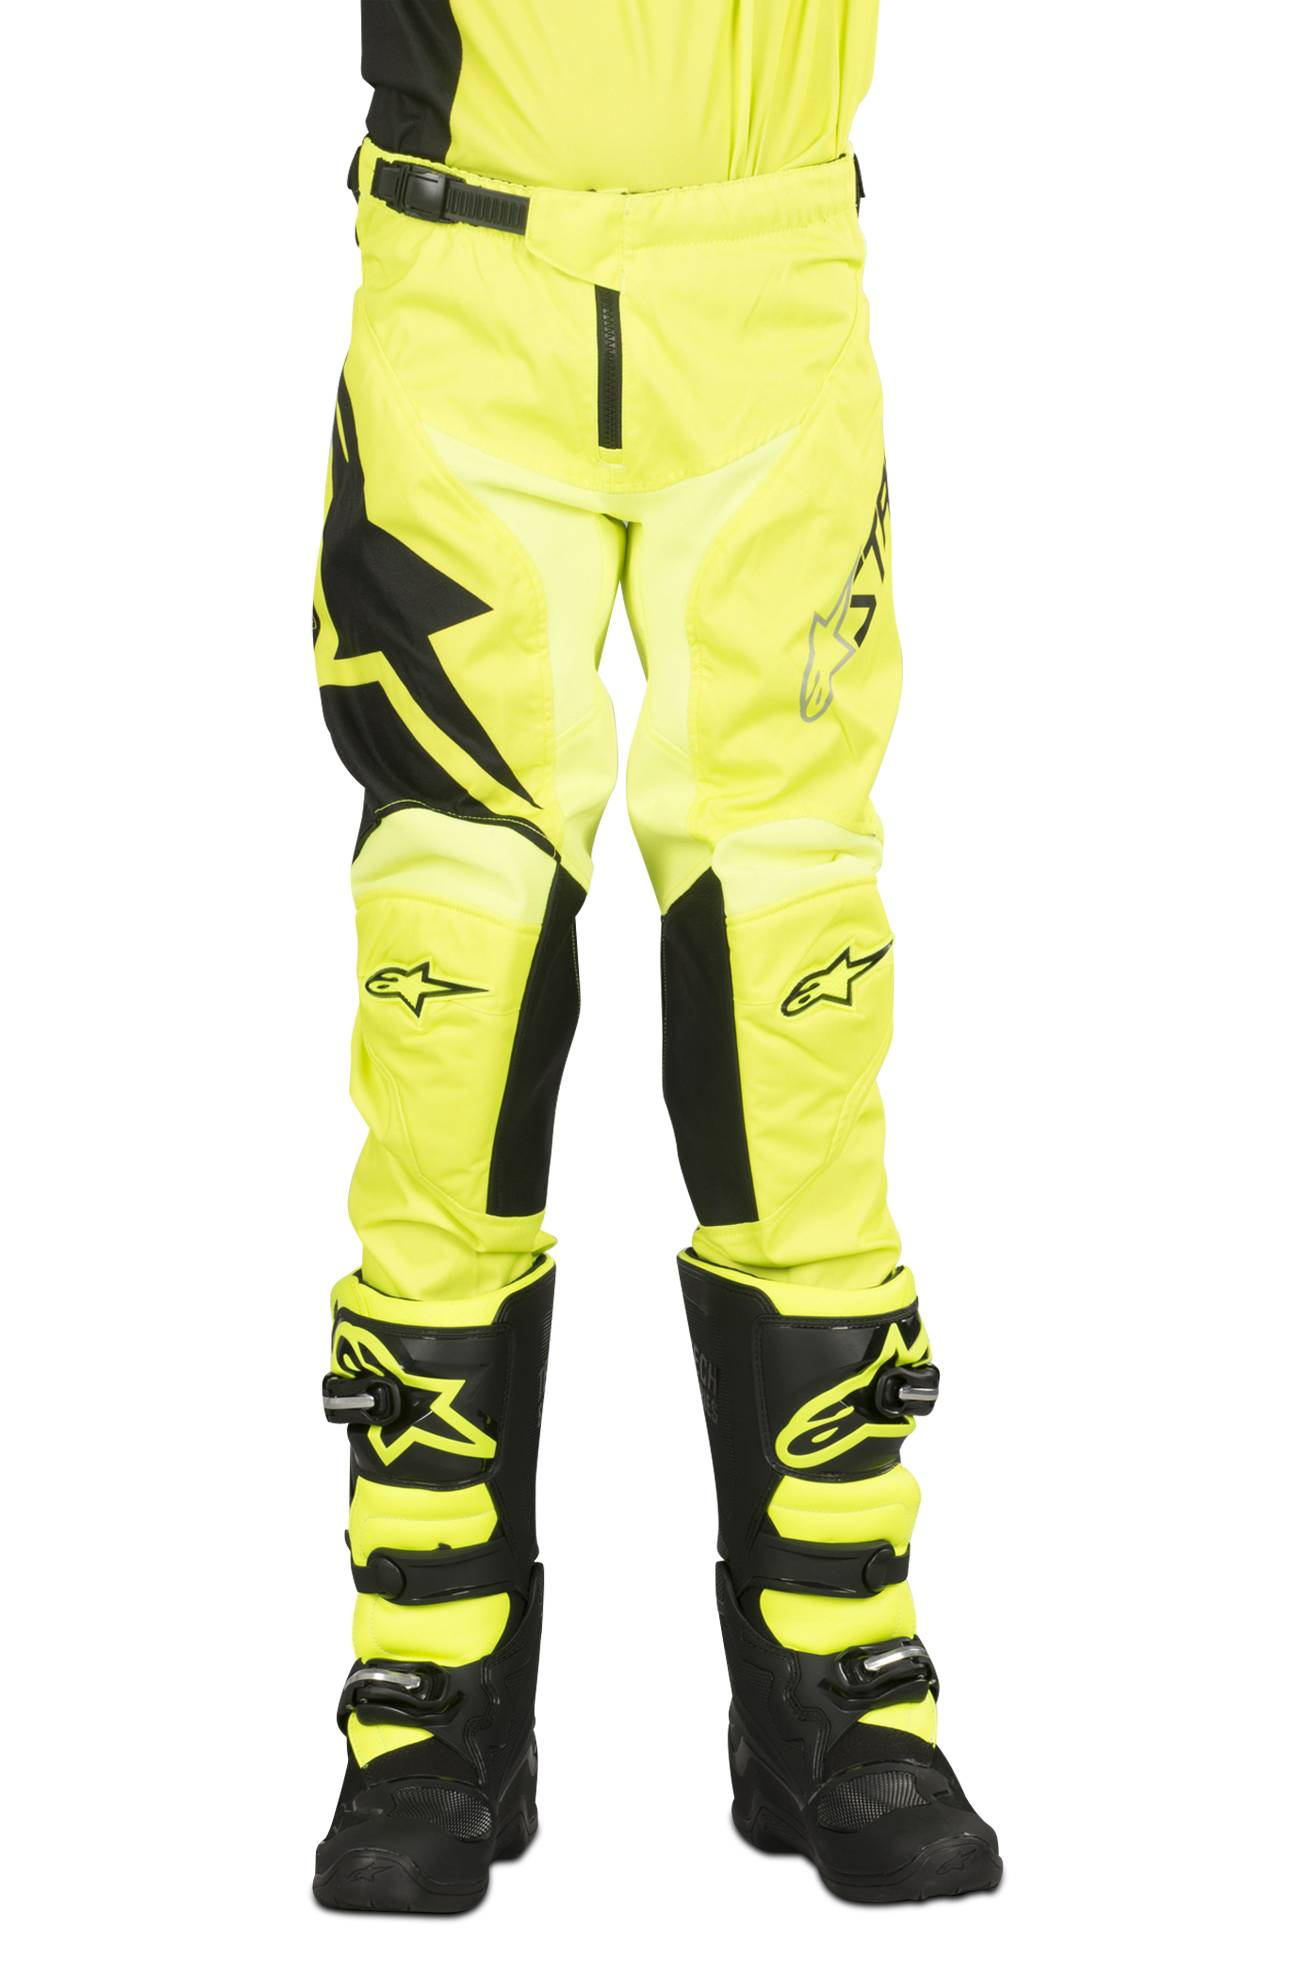 Alpinestars Pantalon Cross Enfant Alpinestars Racer Factory Noir-Jaune Fluo